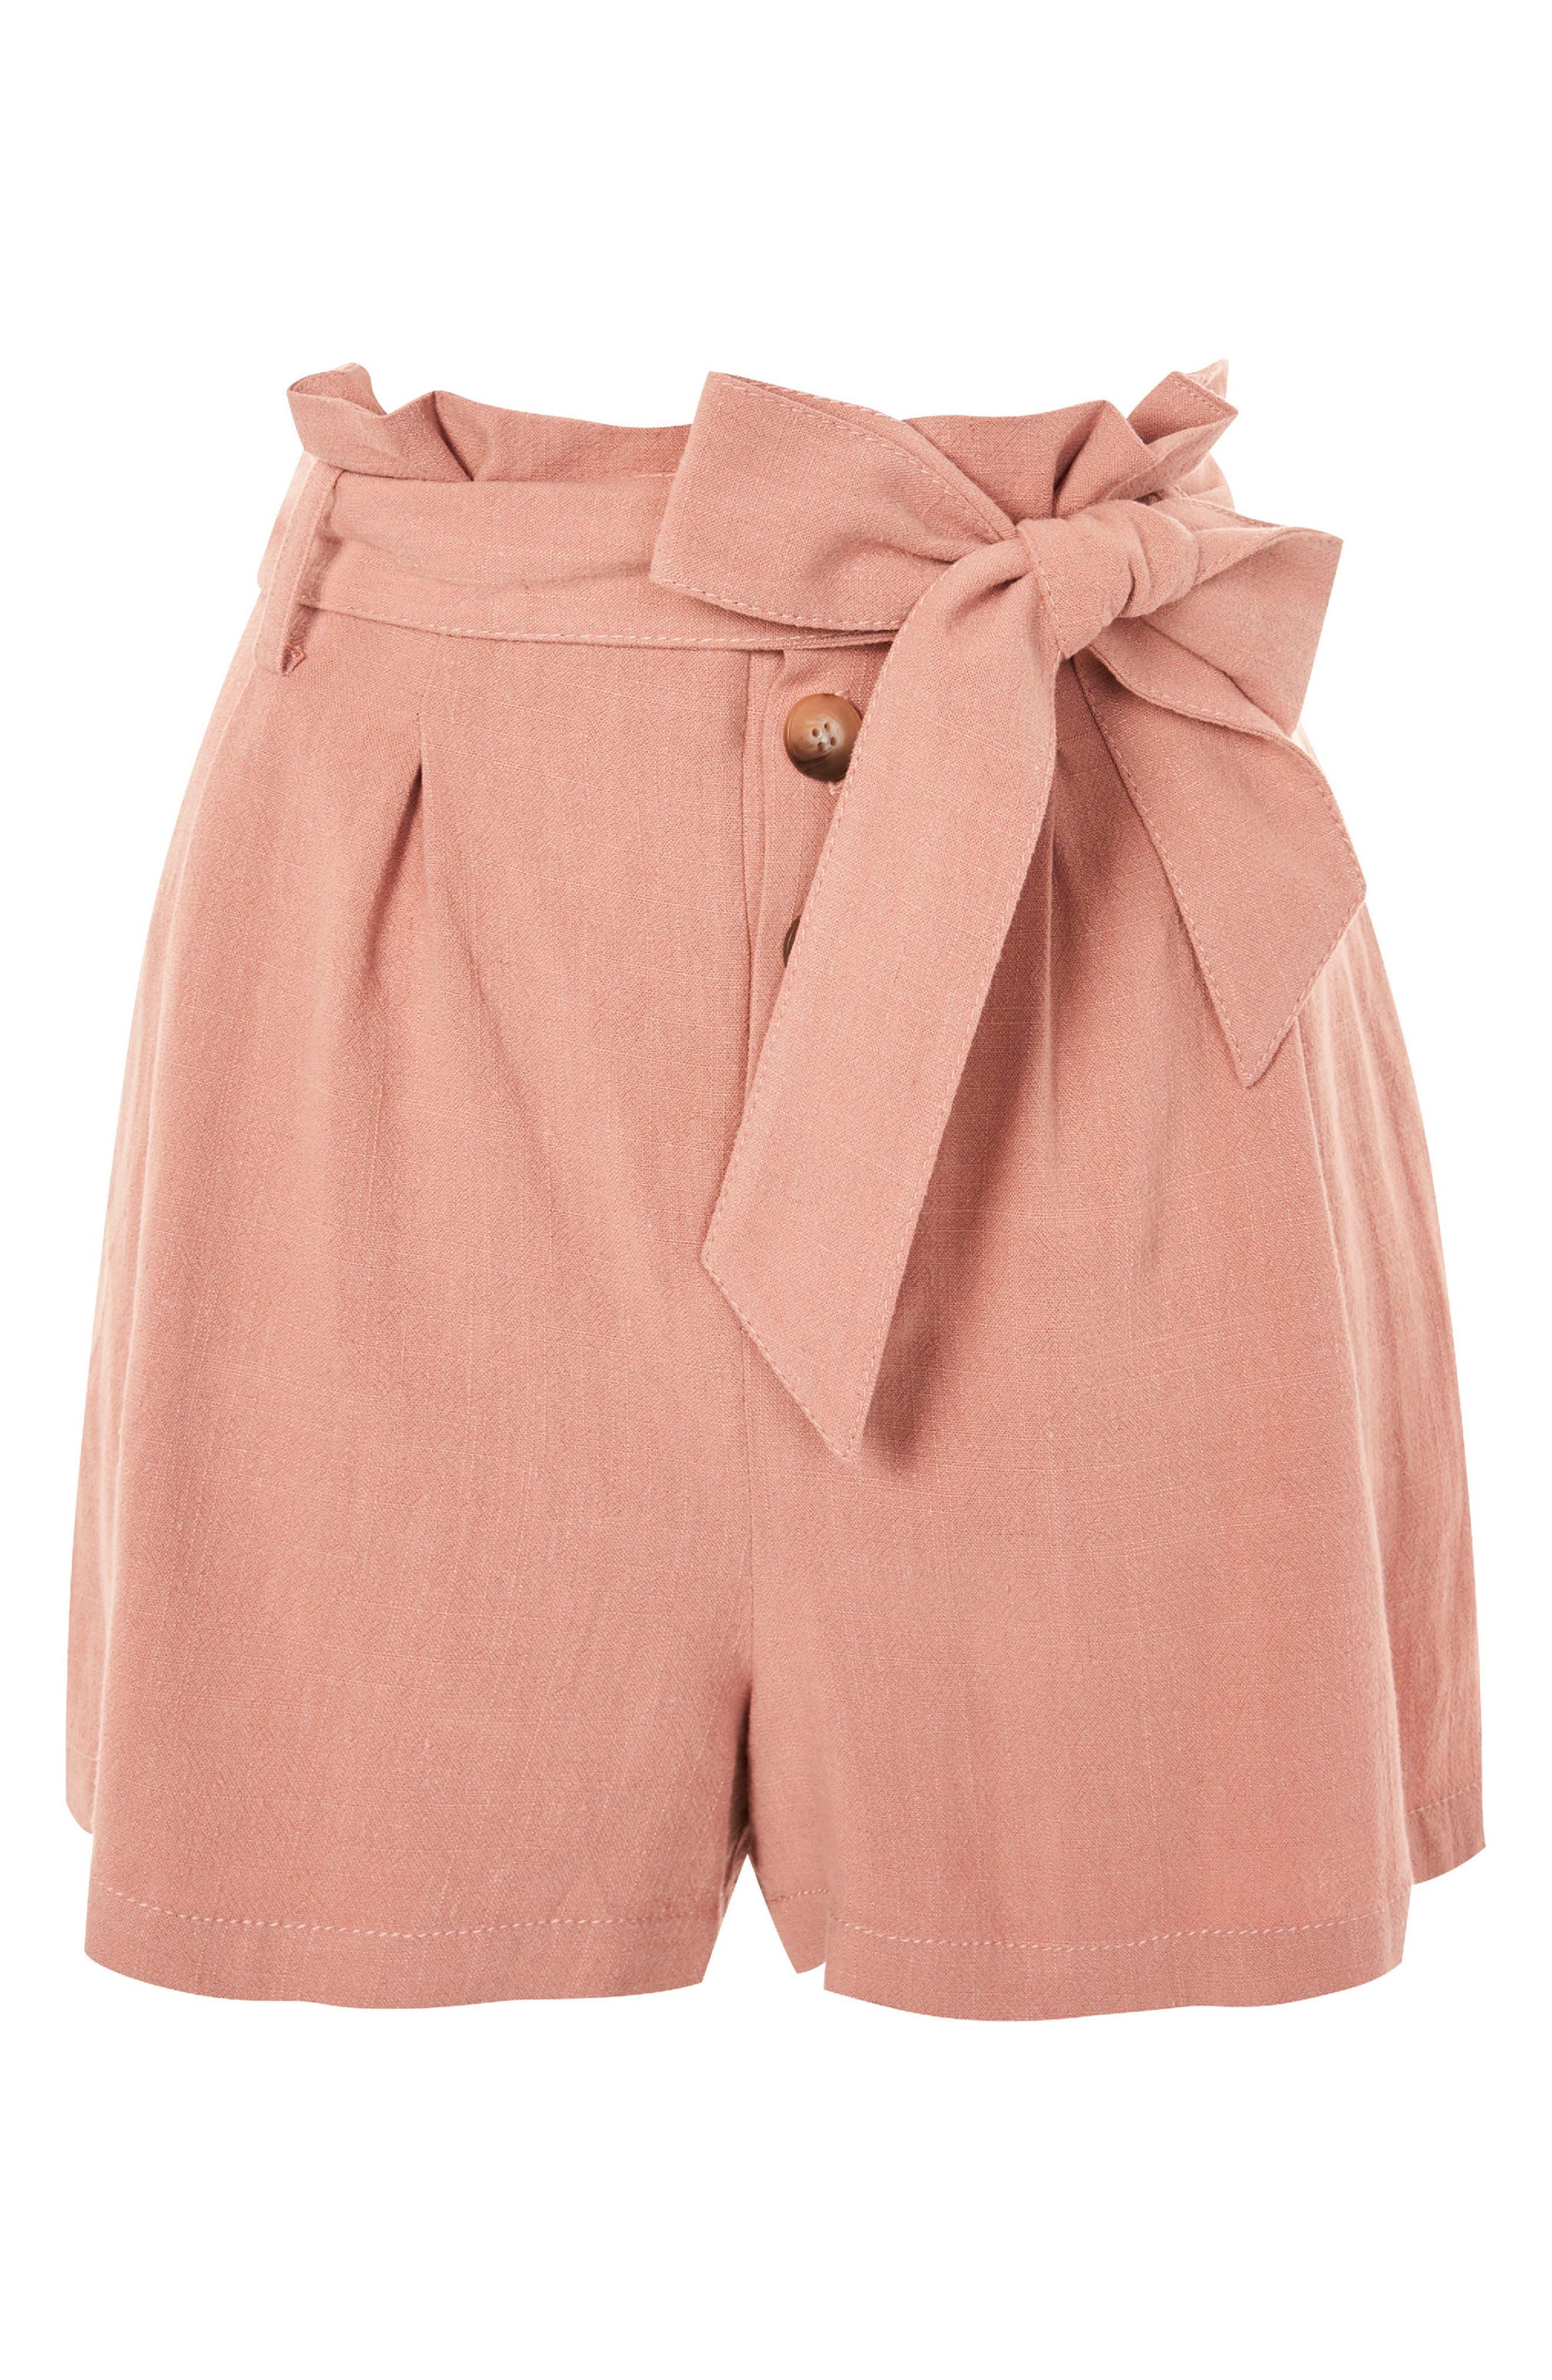 Linen Button Paperbag Shorts,                             Alternate thumbnail 3, color,                             Blush